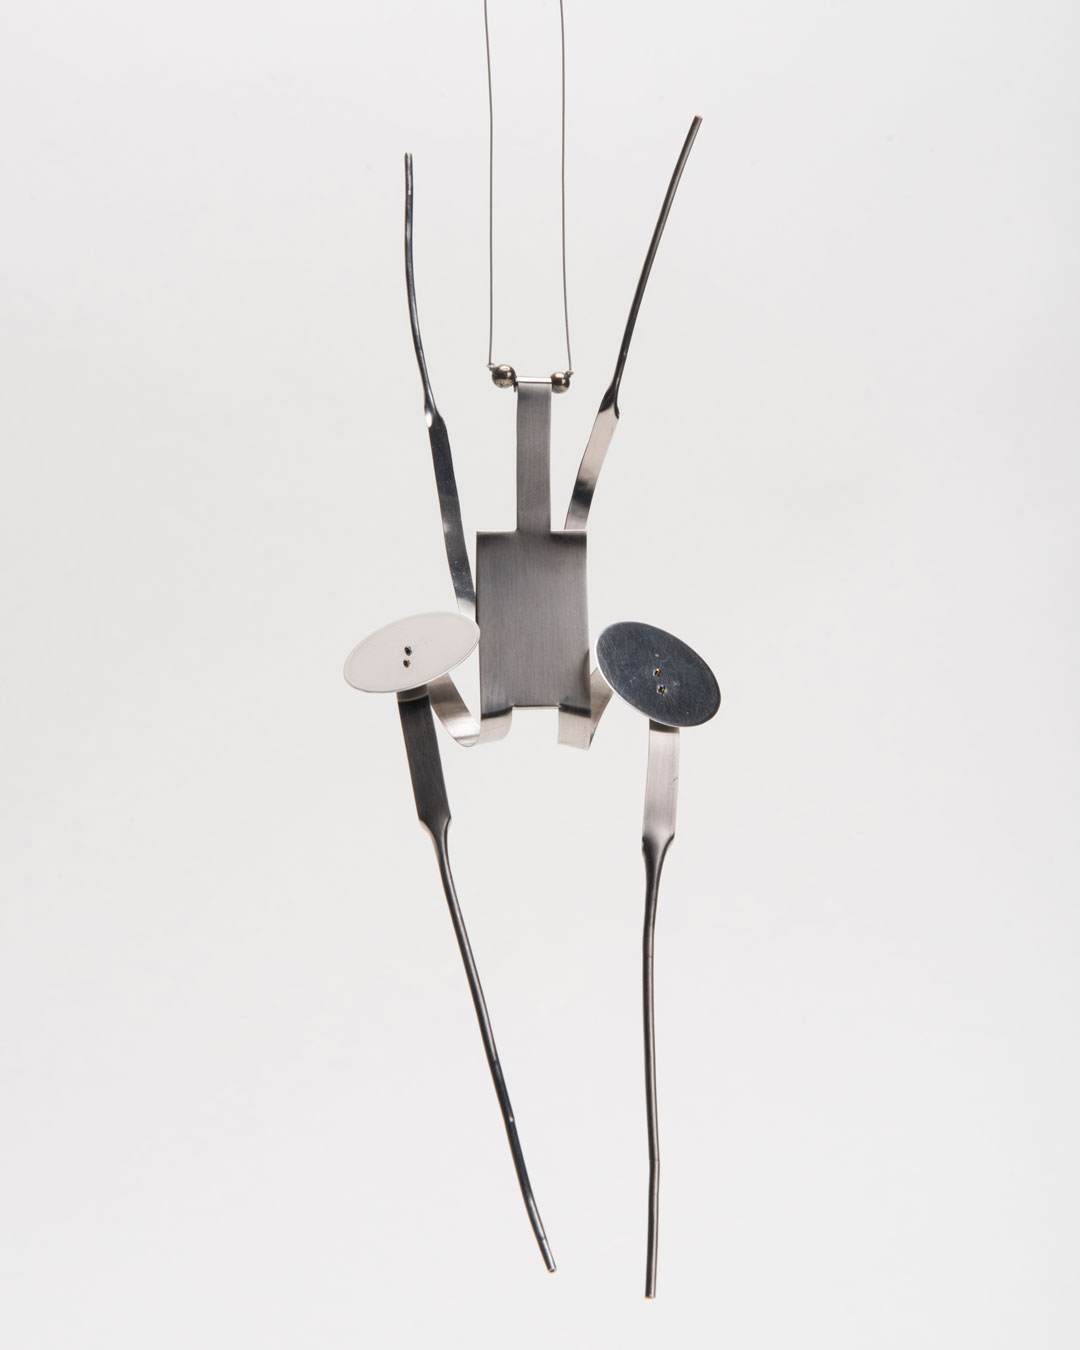 Andrea Wippermann, Mantis Religiosa, 2017, pendant; stainless steel, obsidian beads, blackened silver, nylon, 230 x 70 x 40 mm, €2200